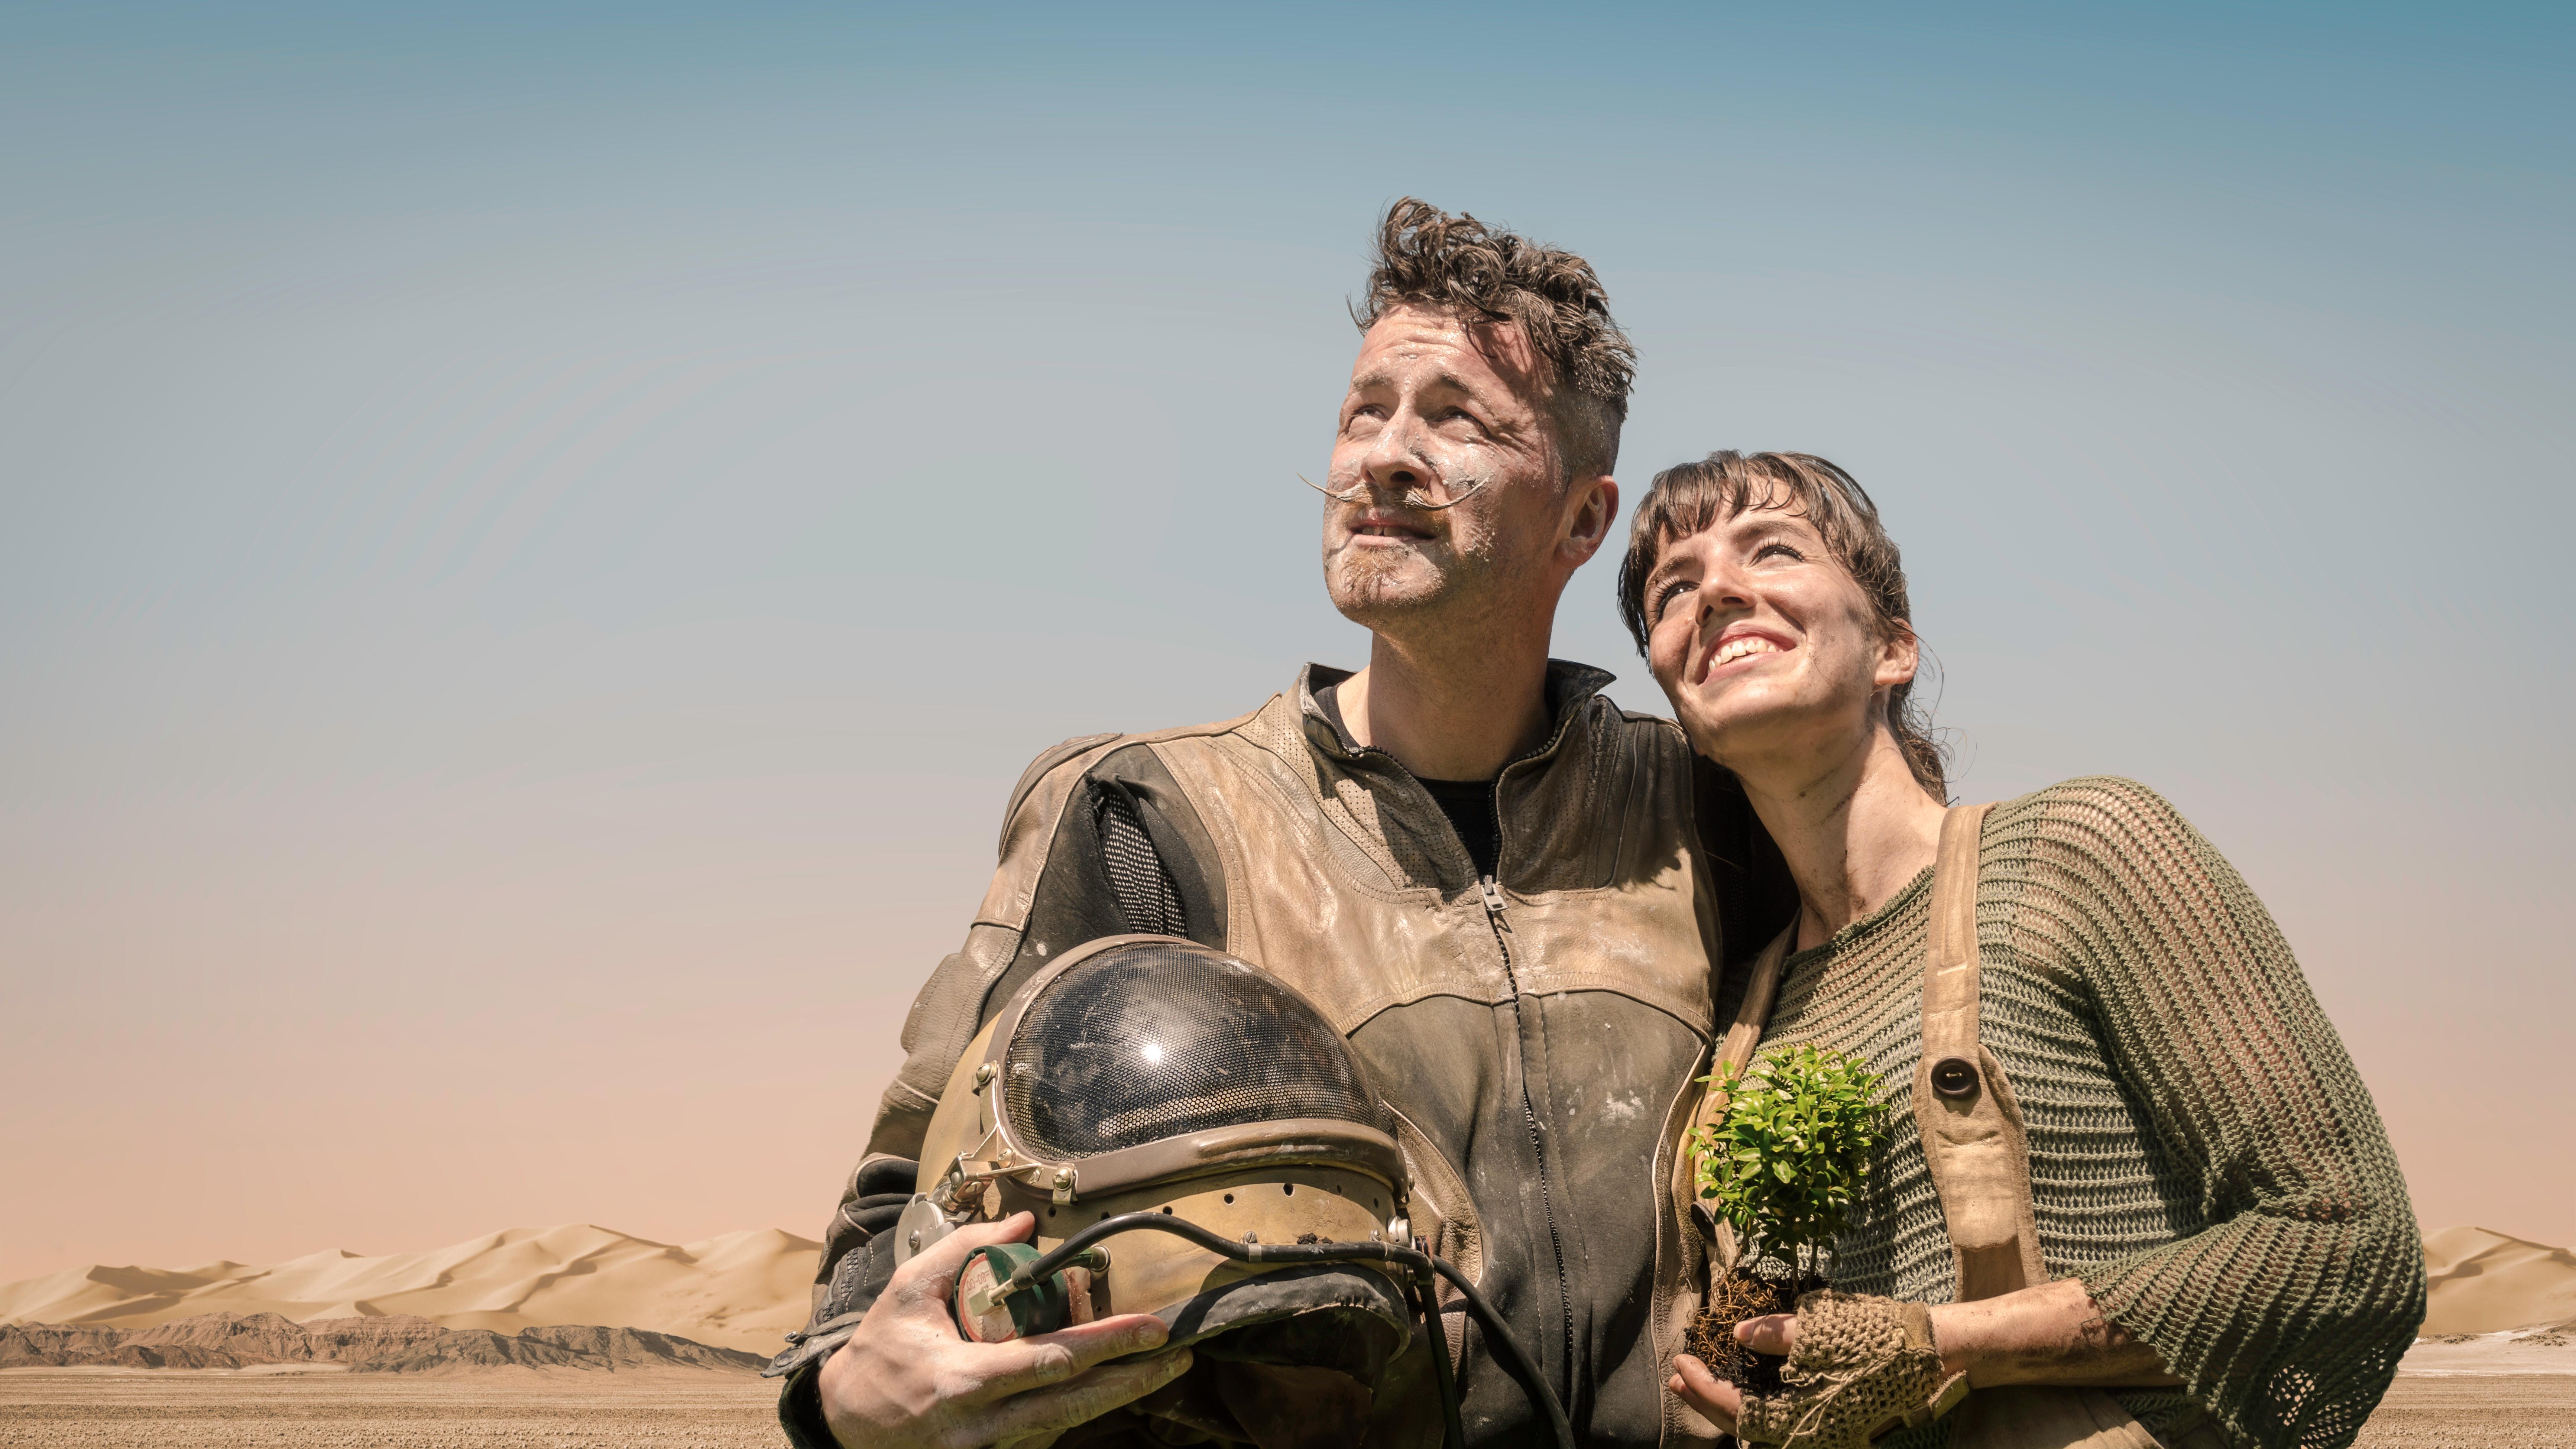 adult-adventure-couple-732894